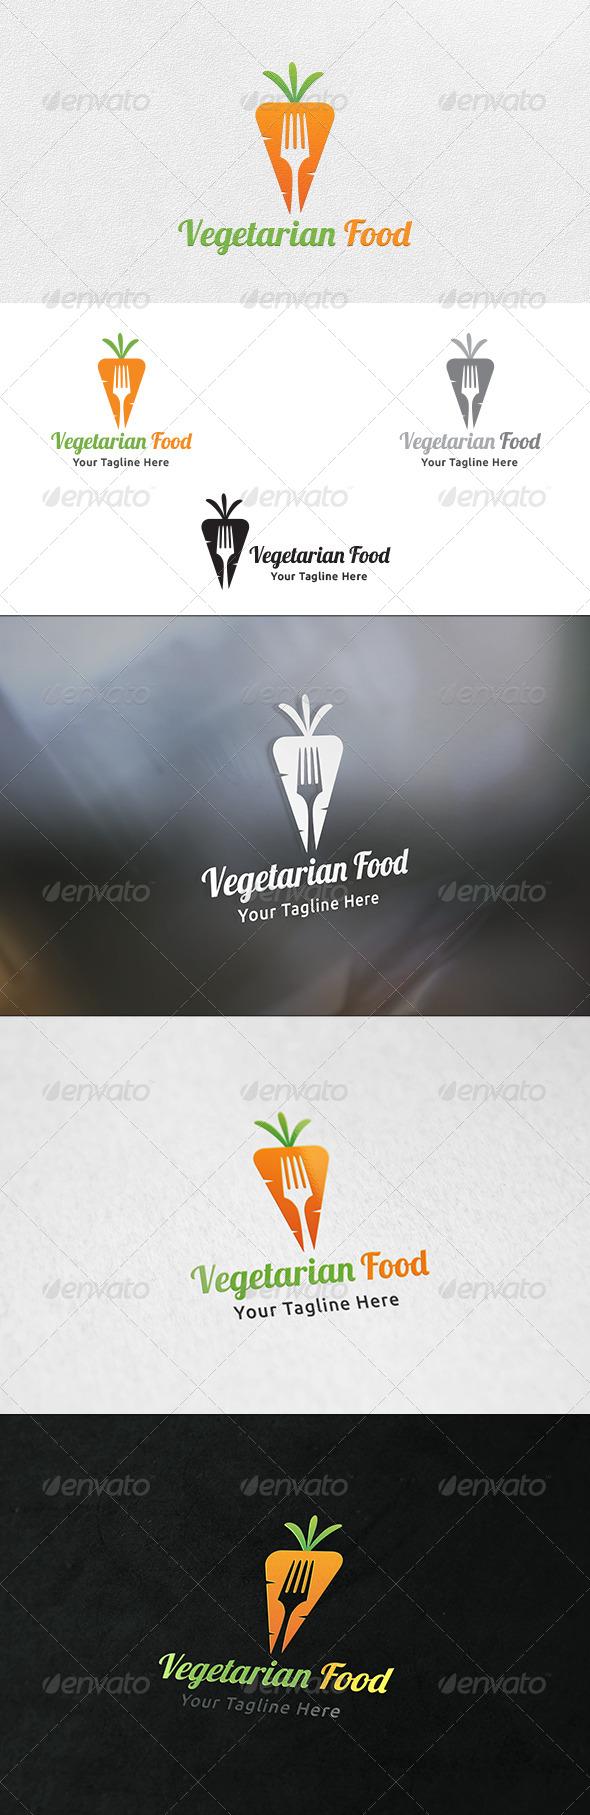 Vegetarian Food - Logo Template - Food Logo Templates